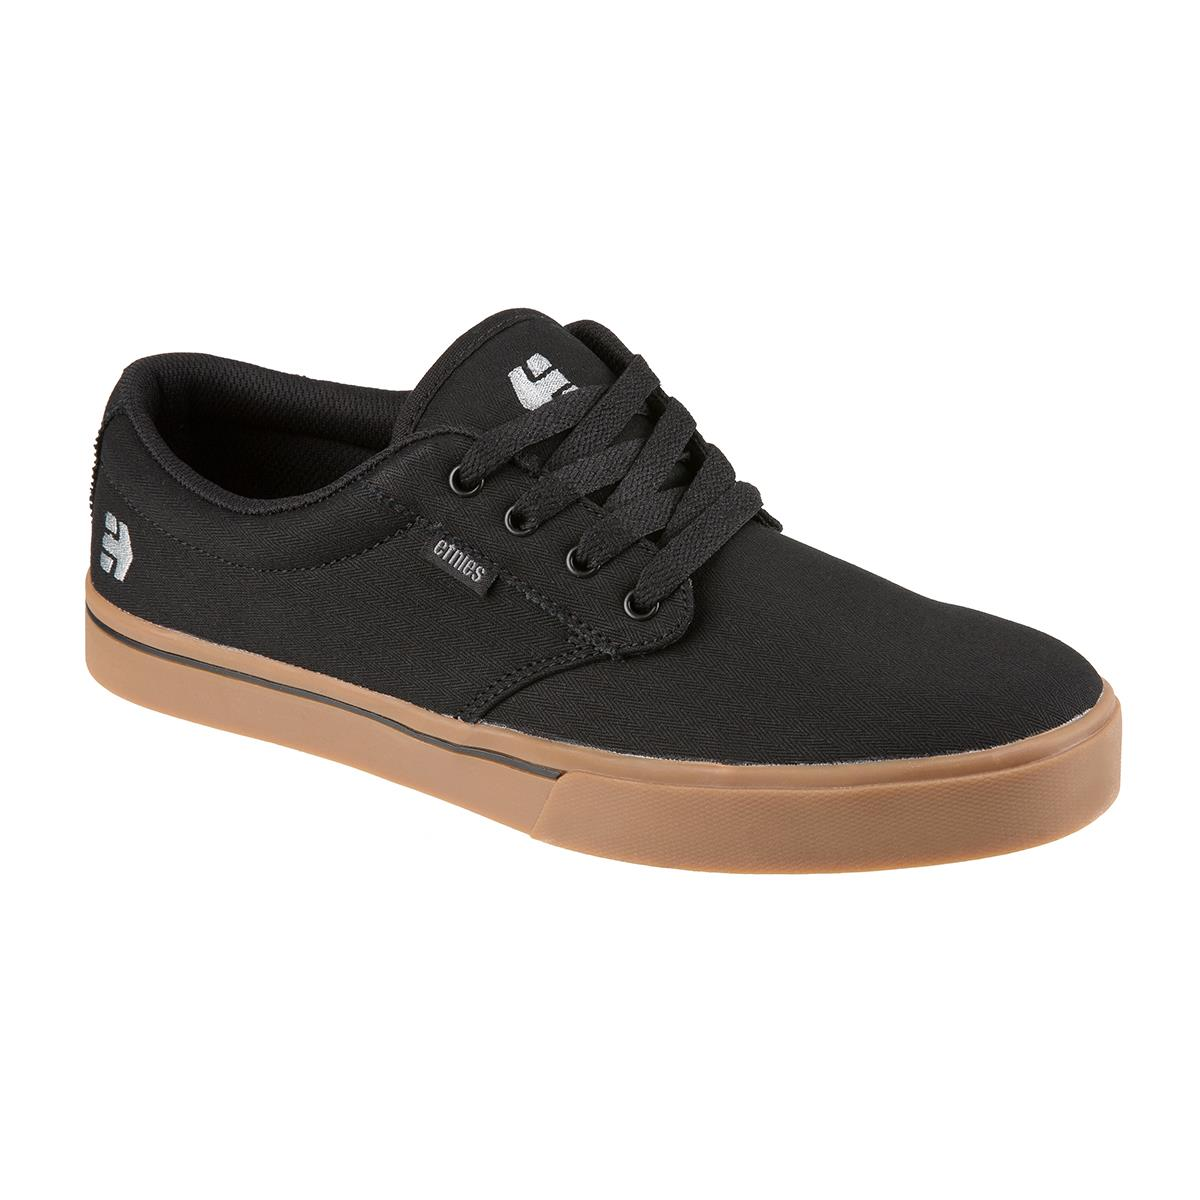 Etnies Shoes Jameson 2 Eco Black/Gum